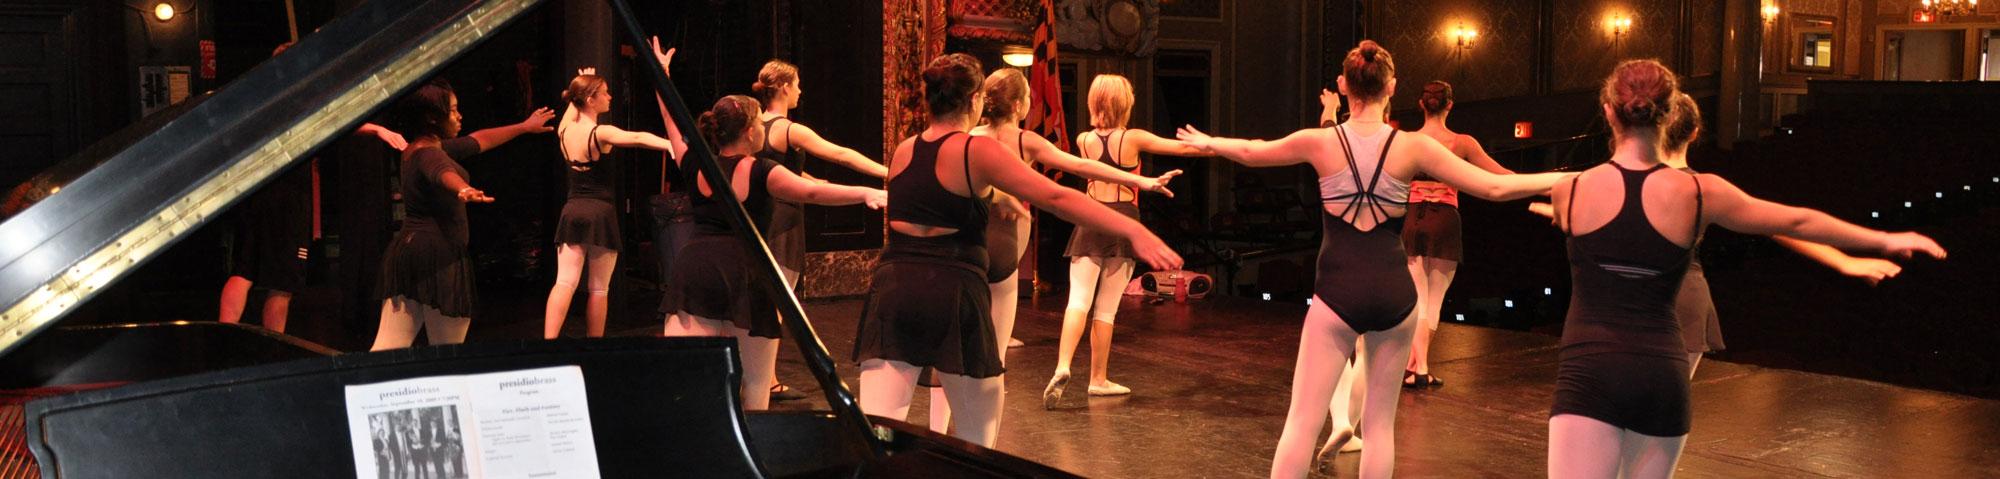 BISFA Dancers